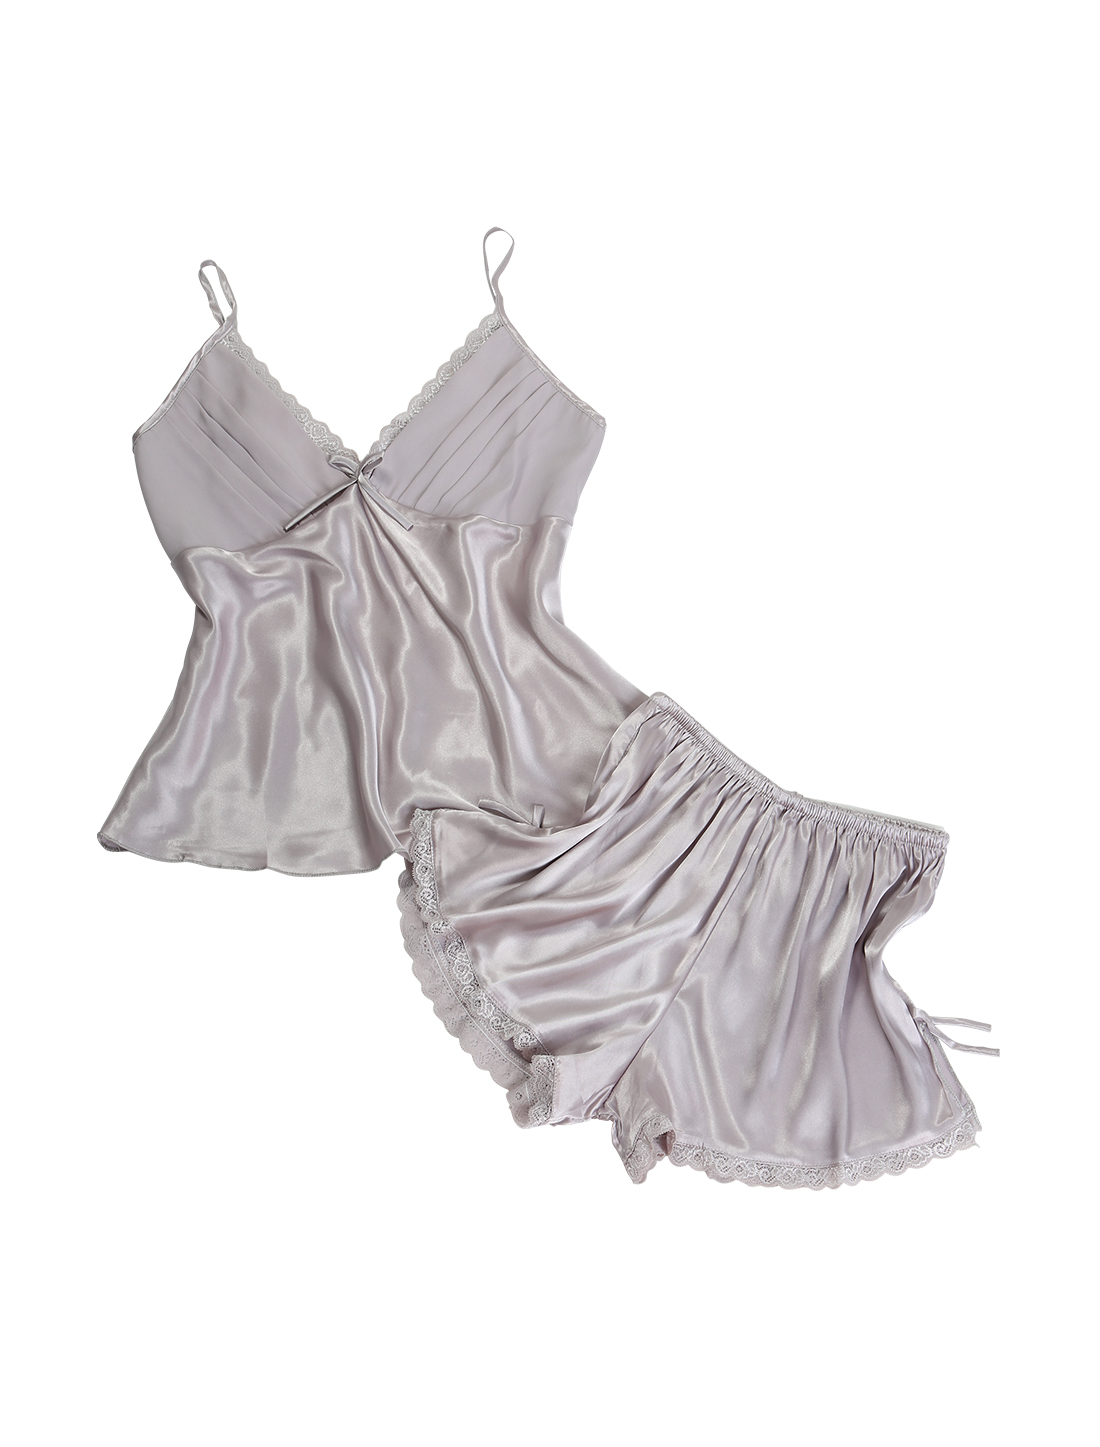 Women Sexy Lace Silk Satin Camisole Shorts Pajama Nightwear Sets Silver Gray L